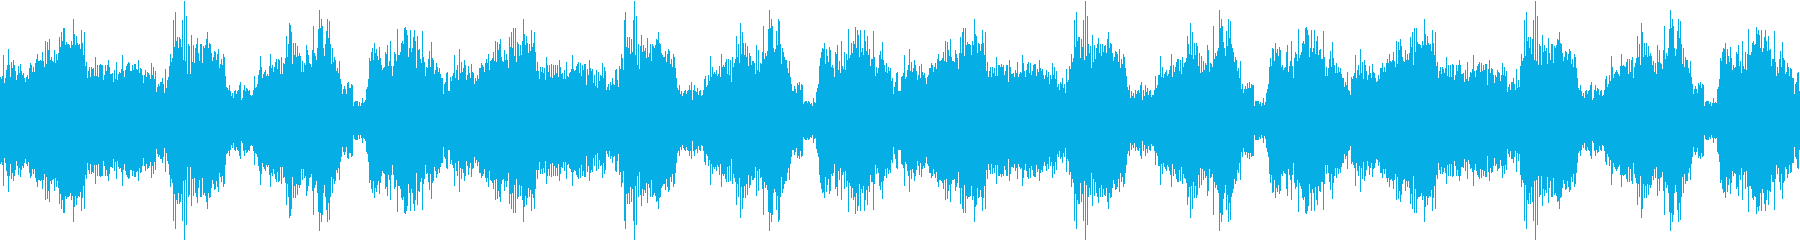 House コードシンセ 5 音楽制作用の再生済みの波形